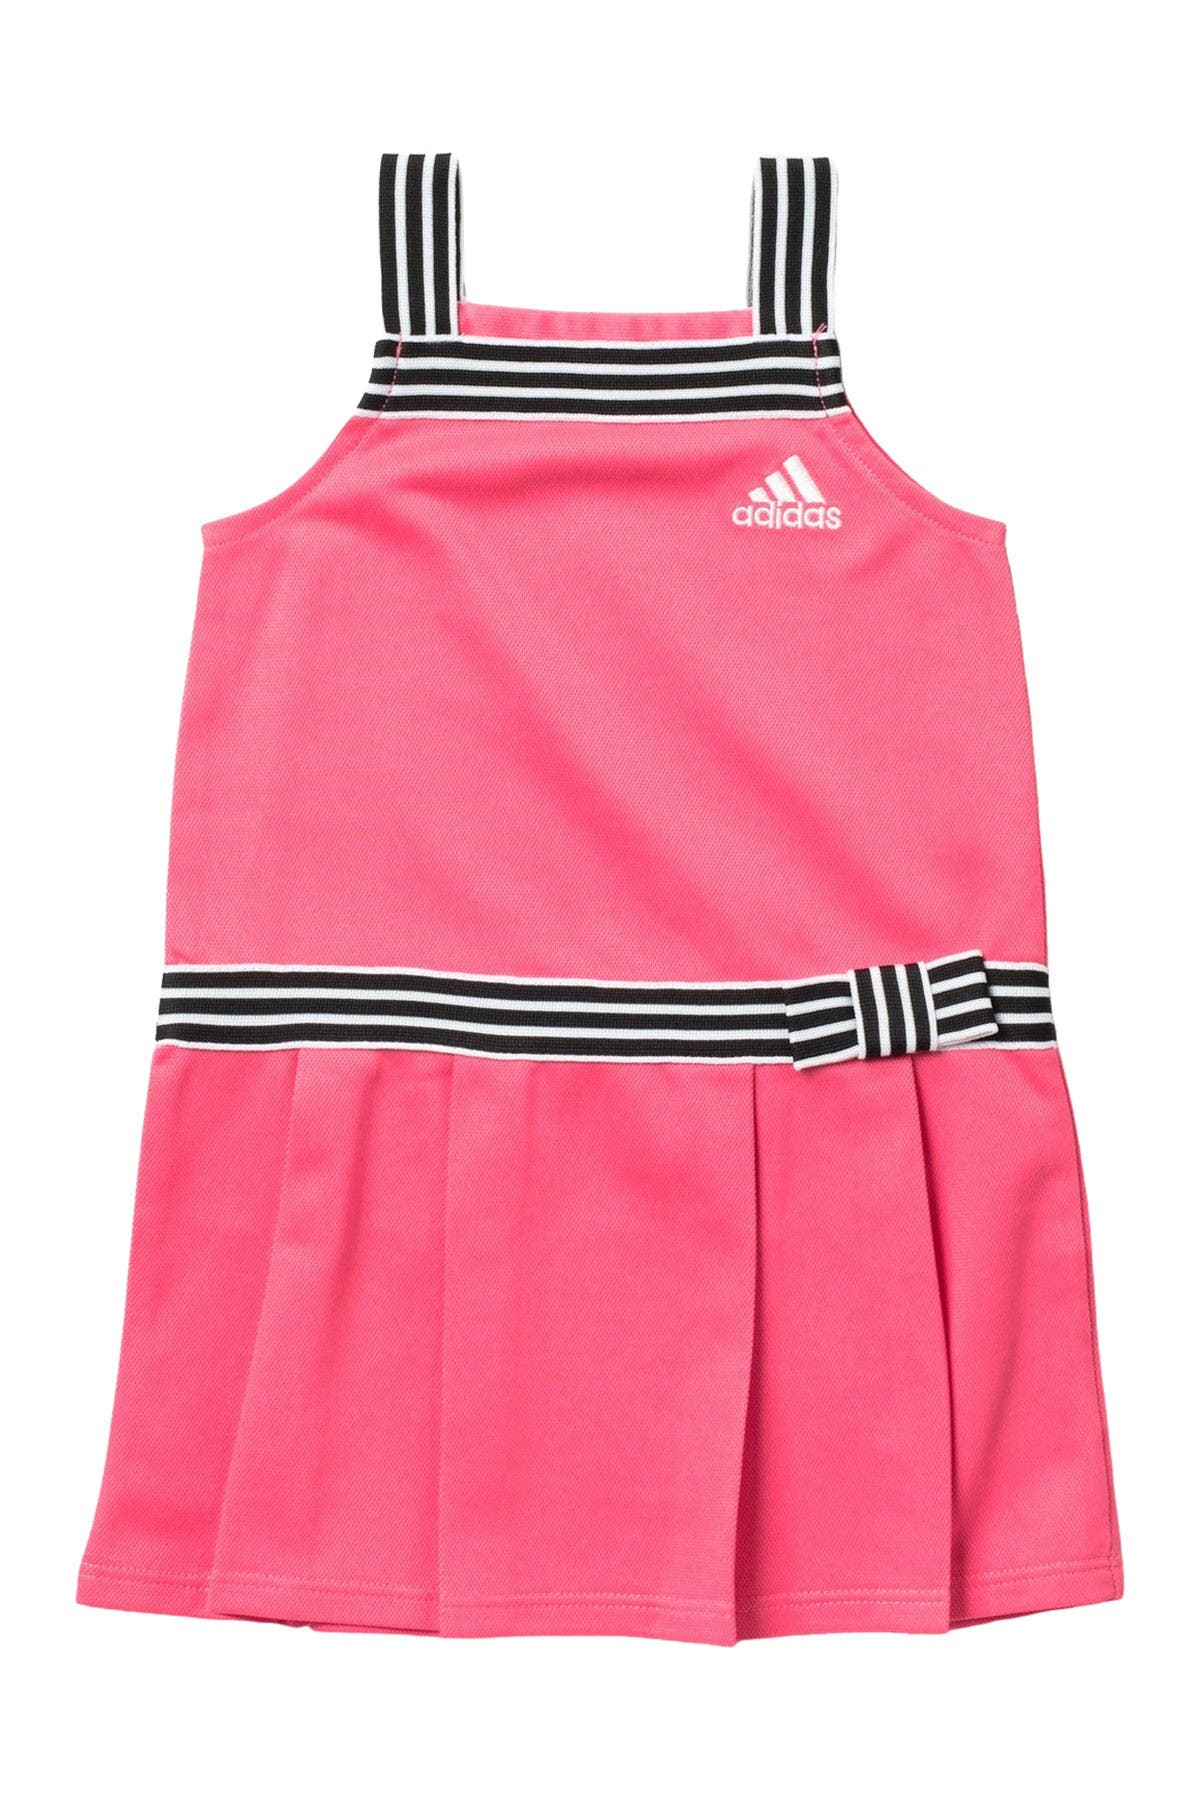 Adidas Sleeveless Dress Toddler Girls Size 3T; 4T